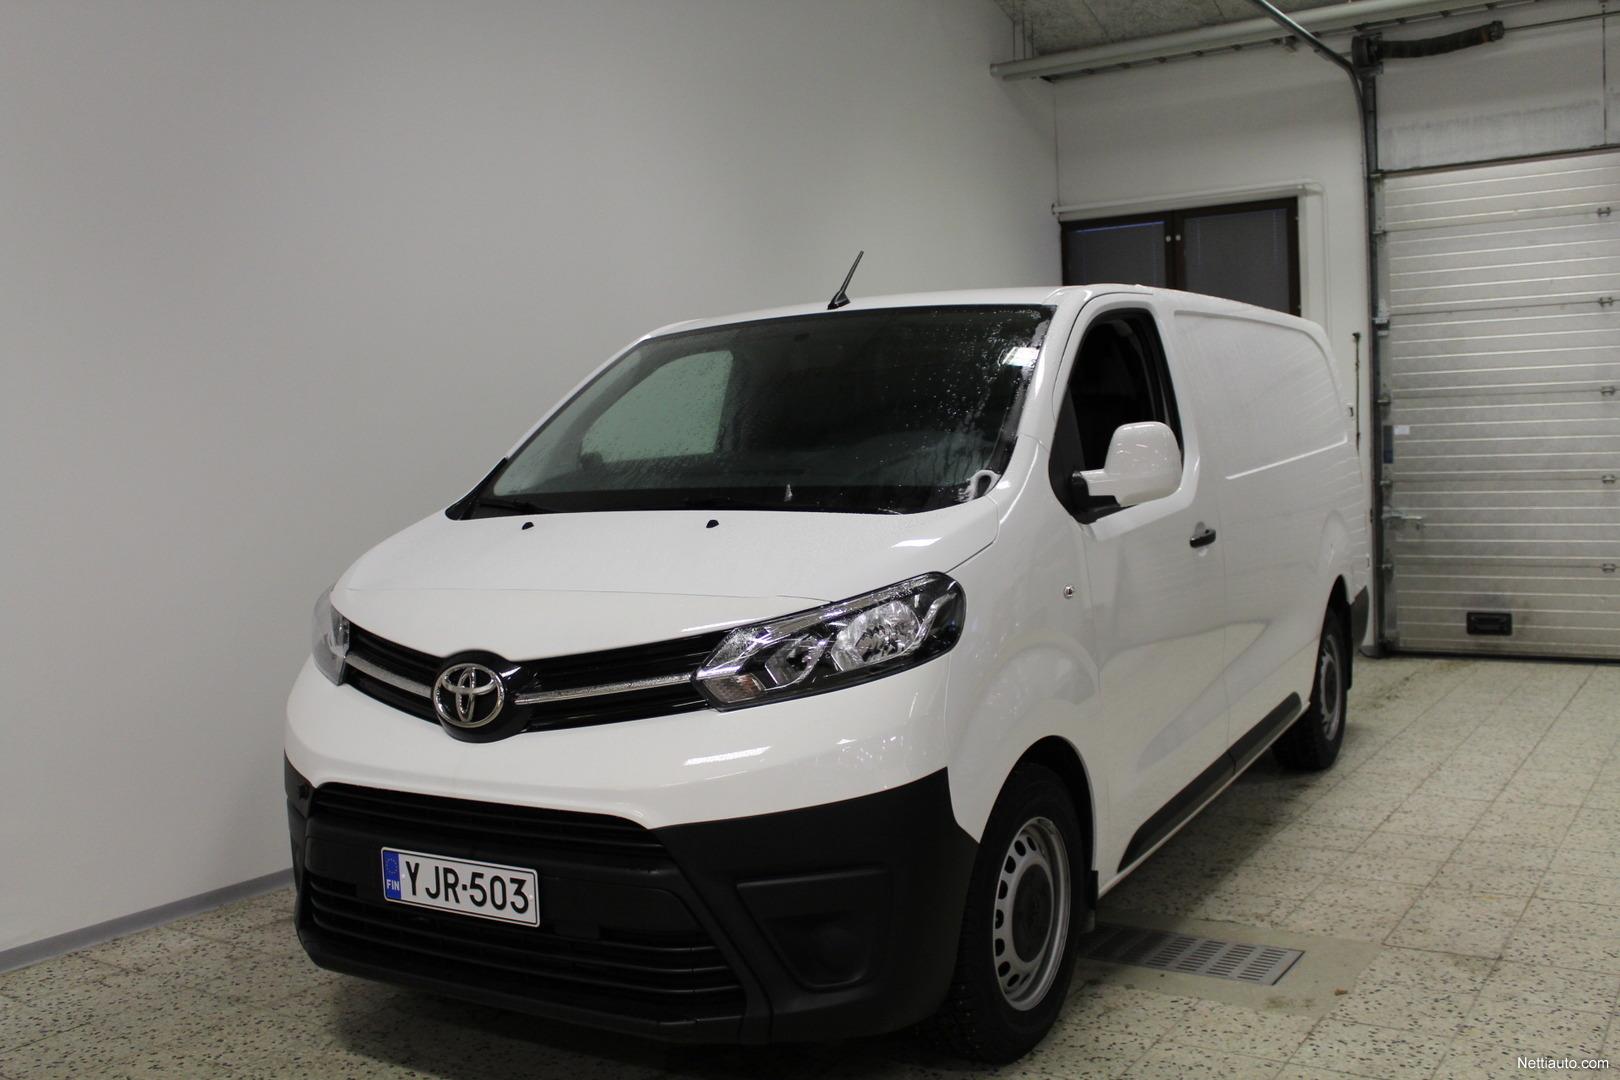 Toyota toyota proace : Toyota Proace L2 2,0 D 120 2018 - Used vehicle - Nettiauto